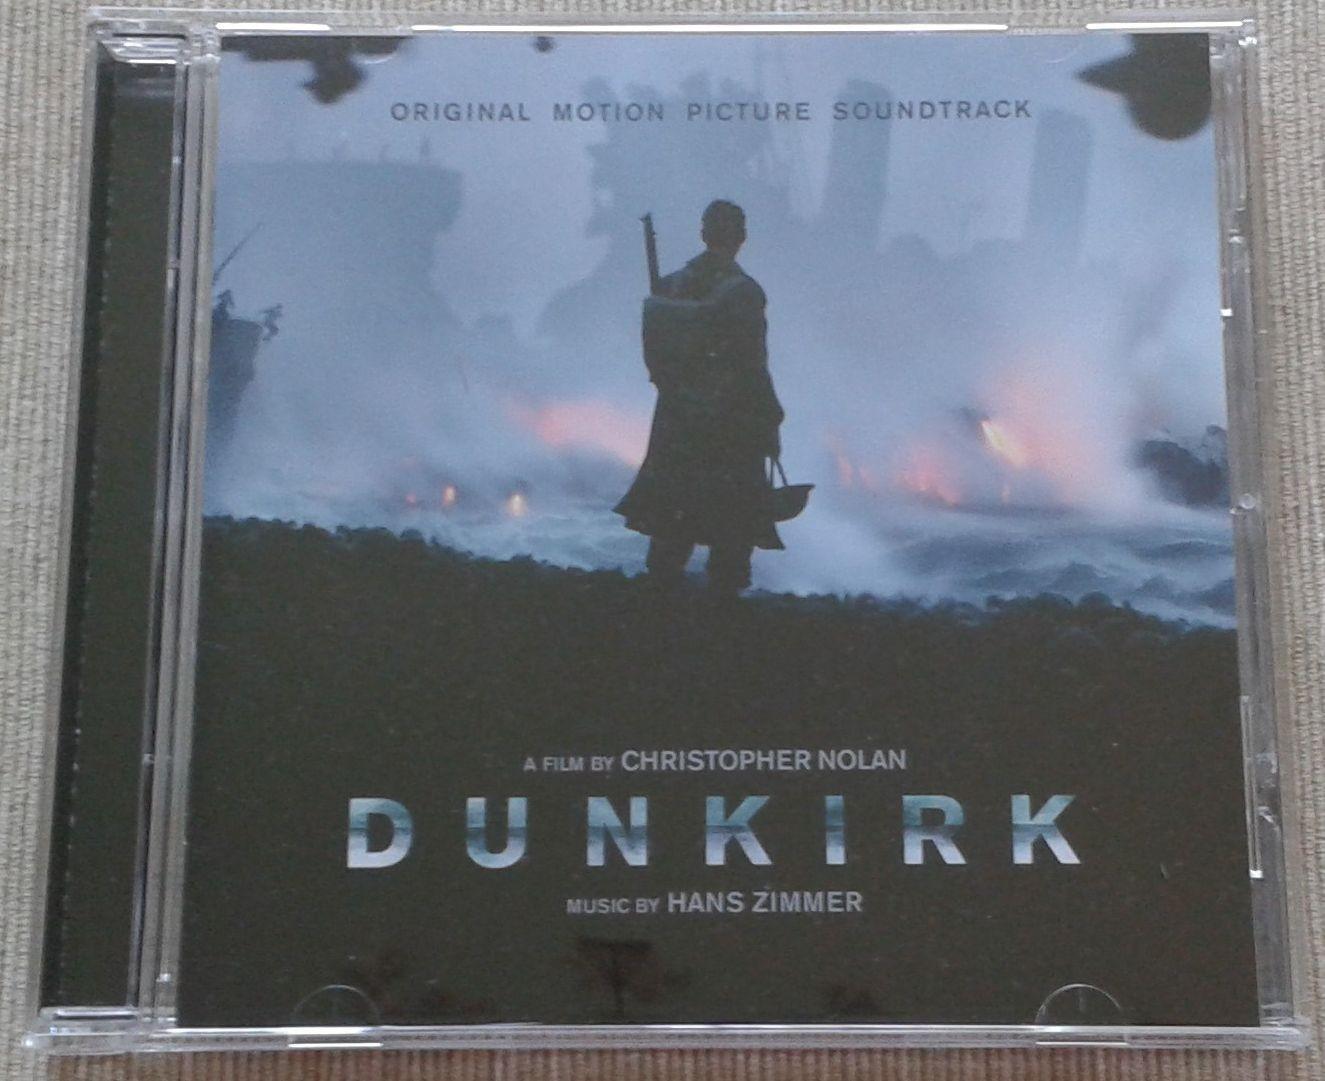 1. Dunkirk front.jpg